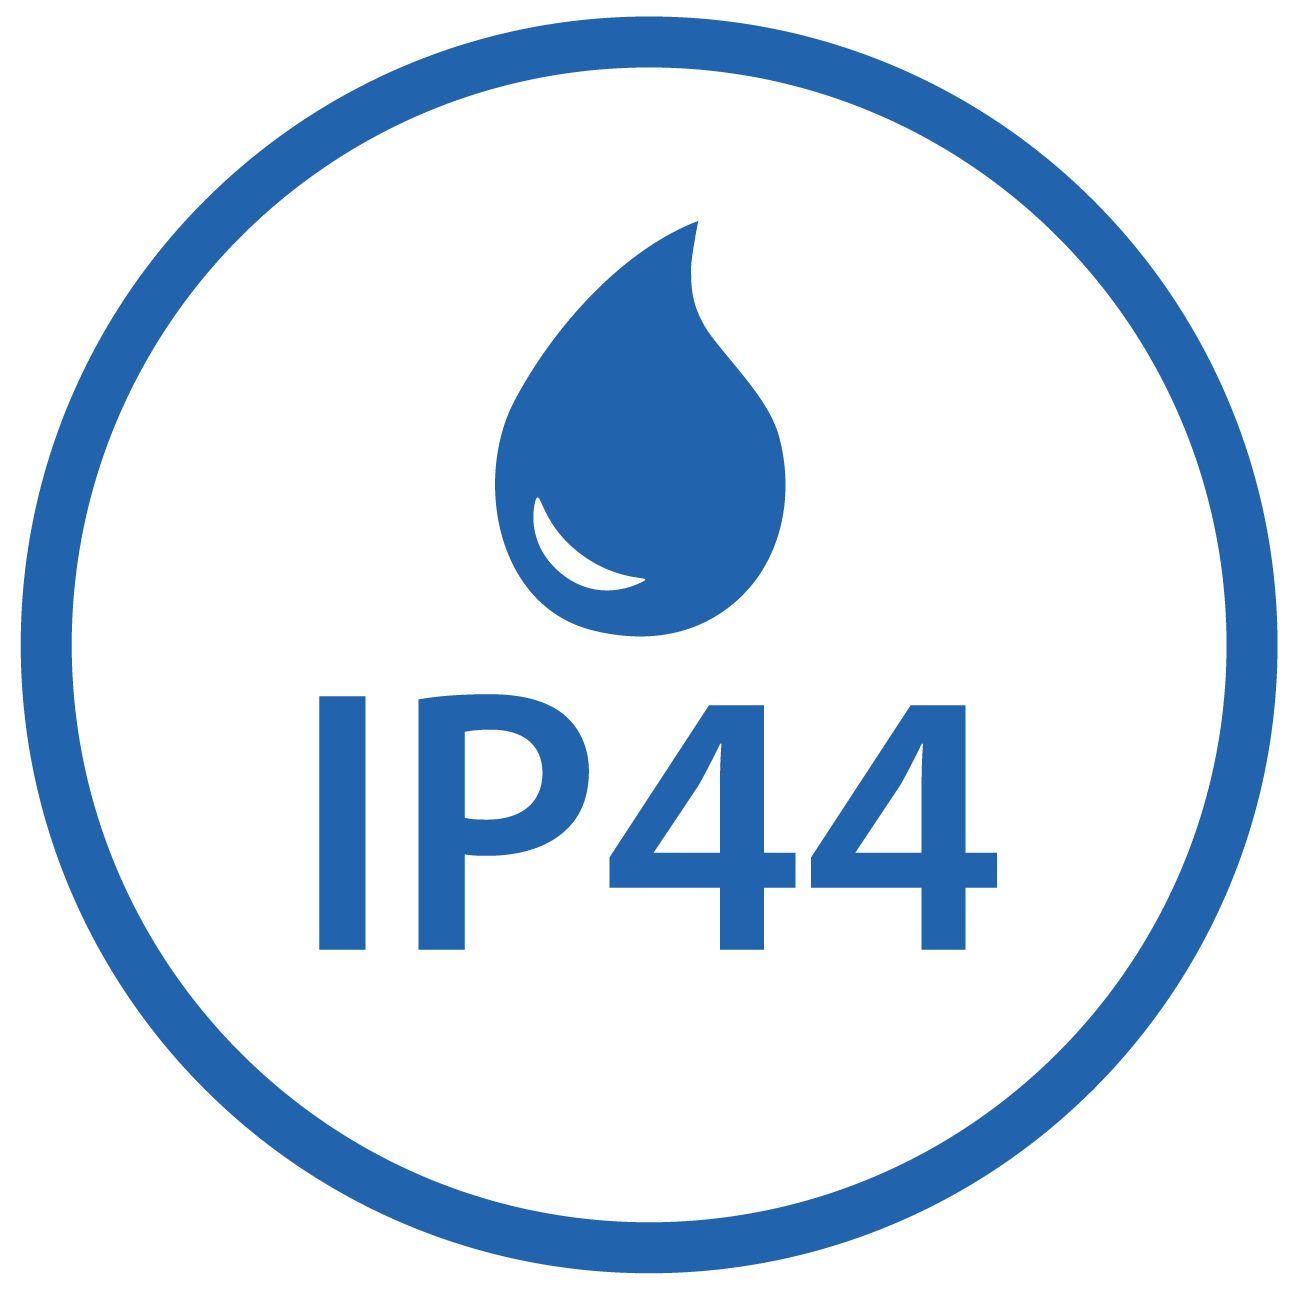 IP44 Stainless Steel Grated Outdoor Bollard